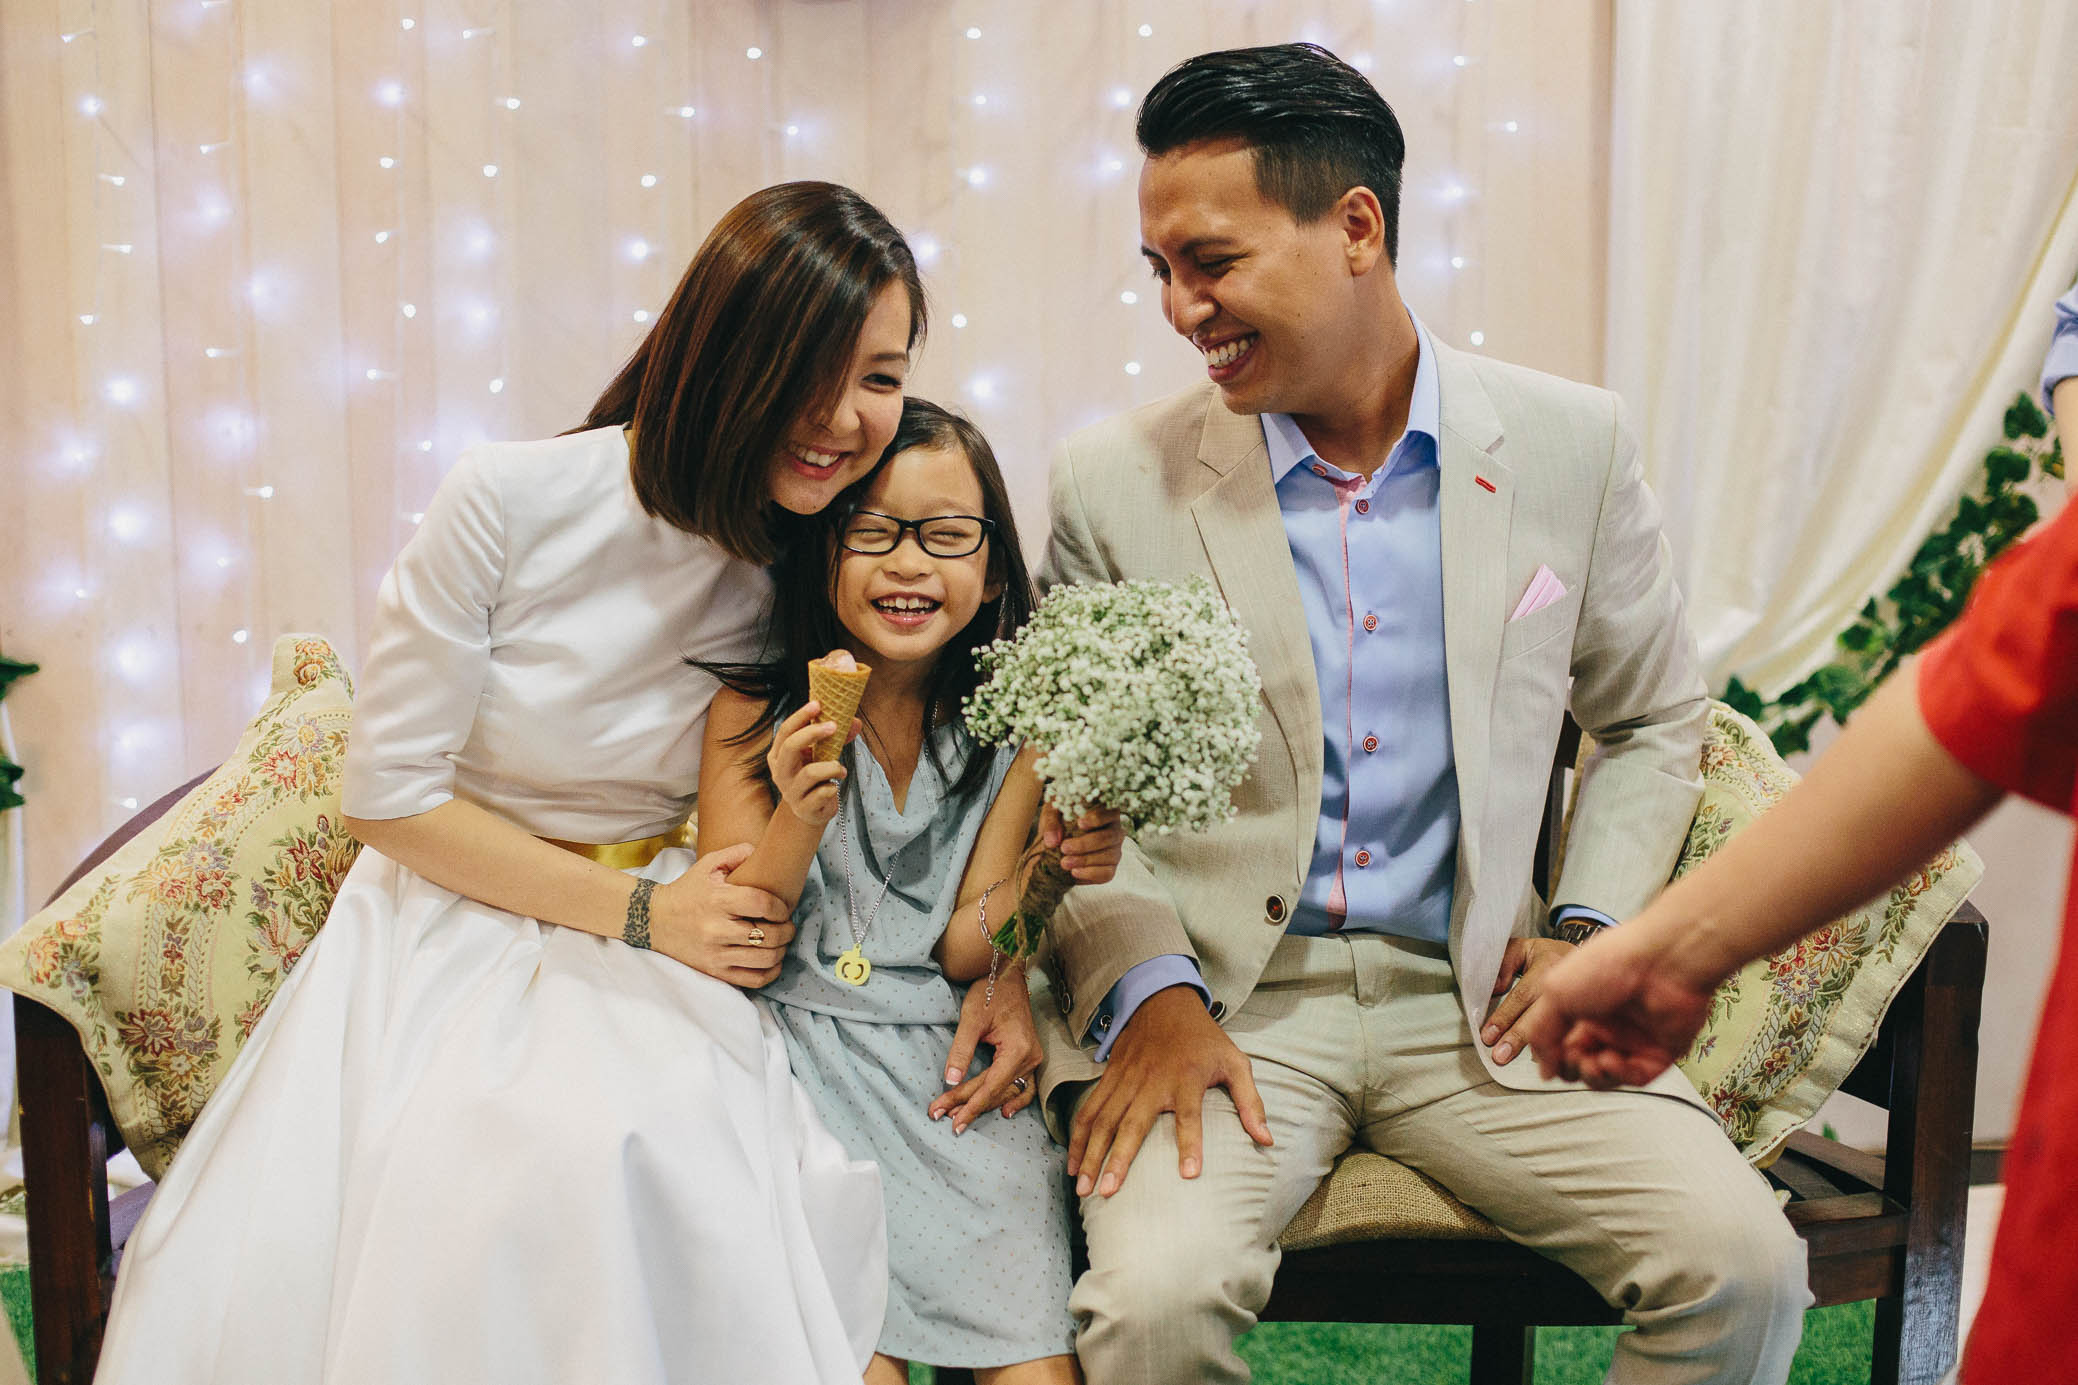 singapore-wedding-photographer-malay-indian-pre-wedding-travel-wmt-2015-alif-ethel-55.jpg